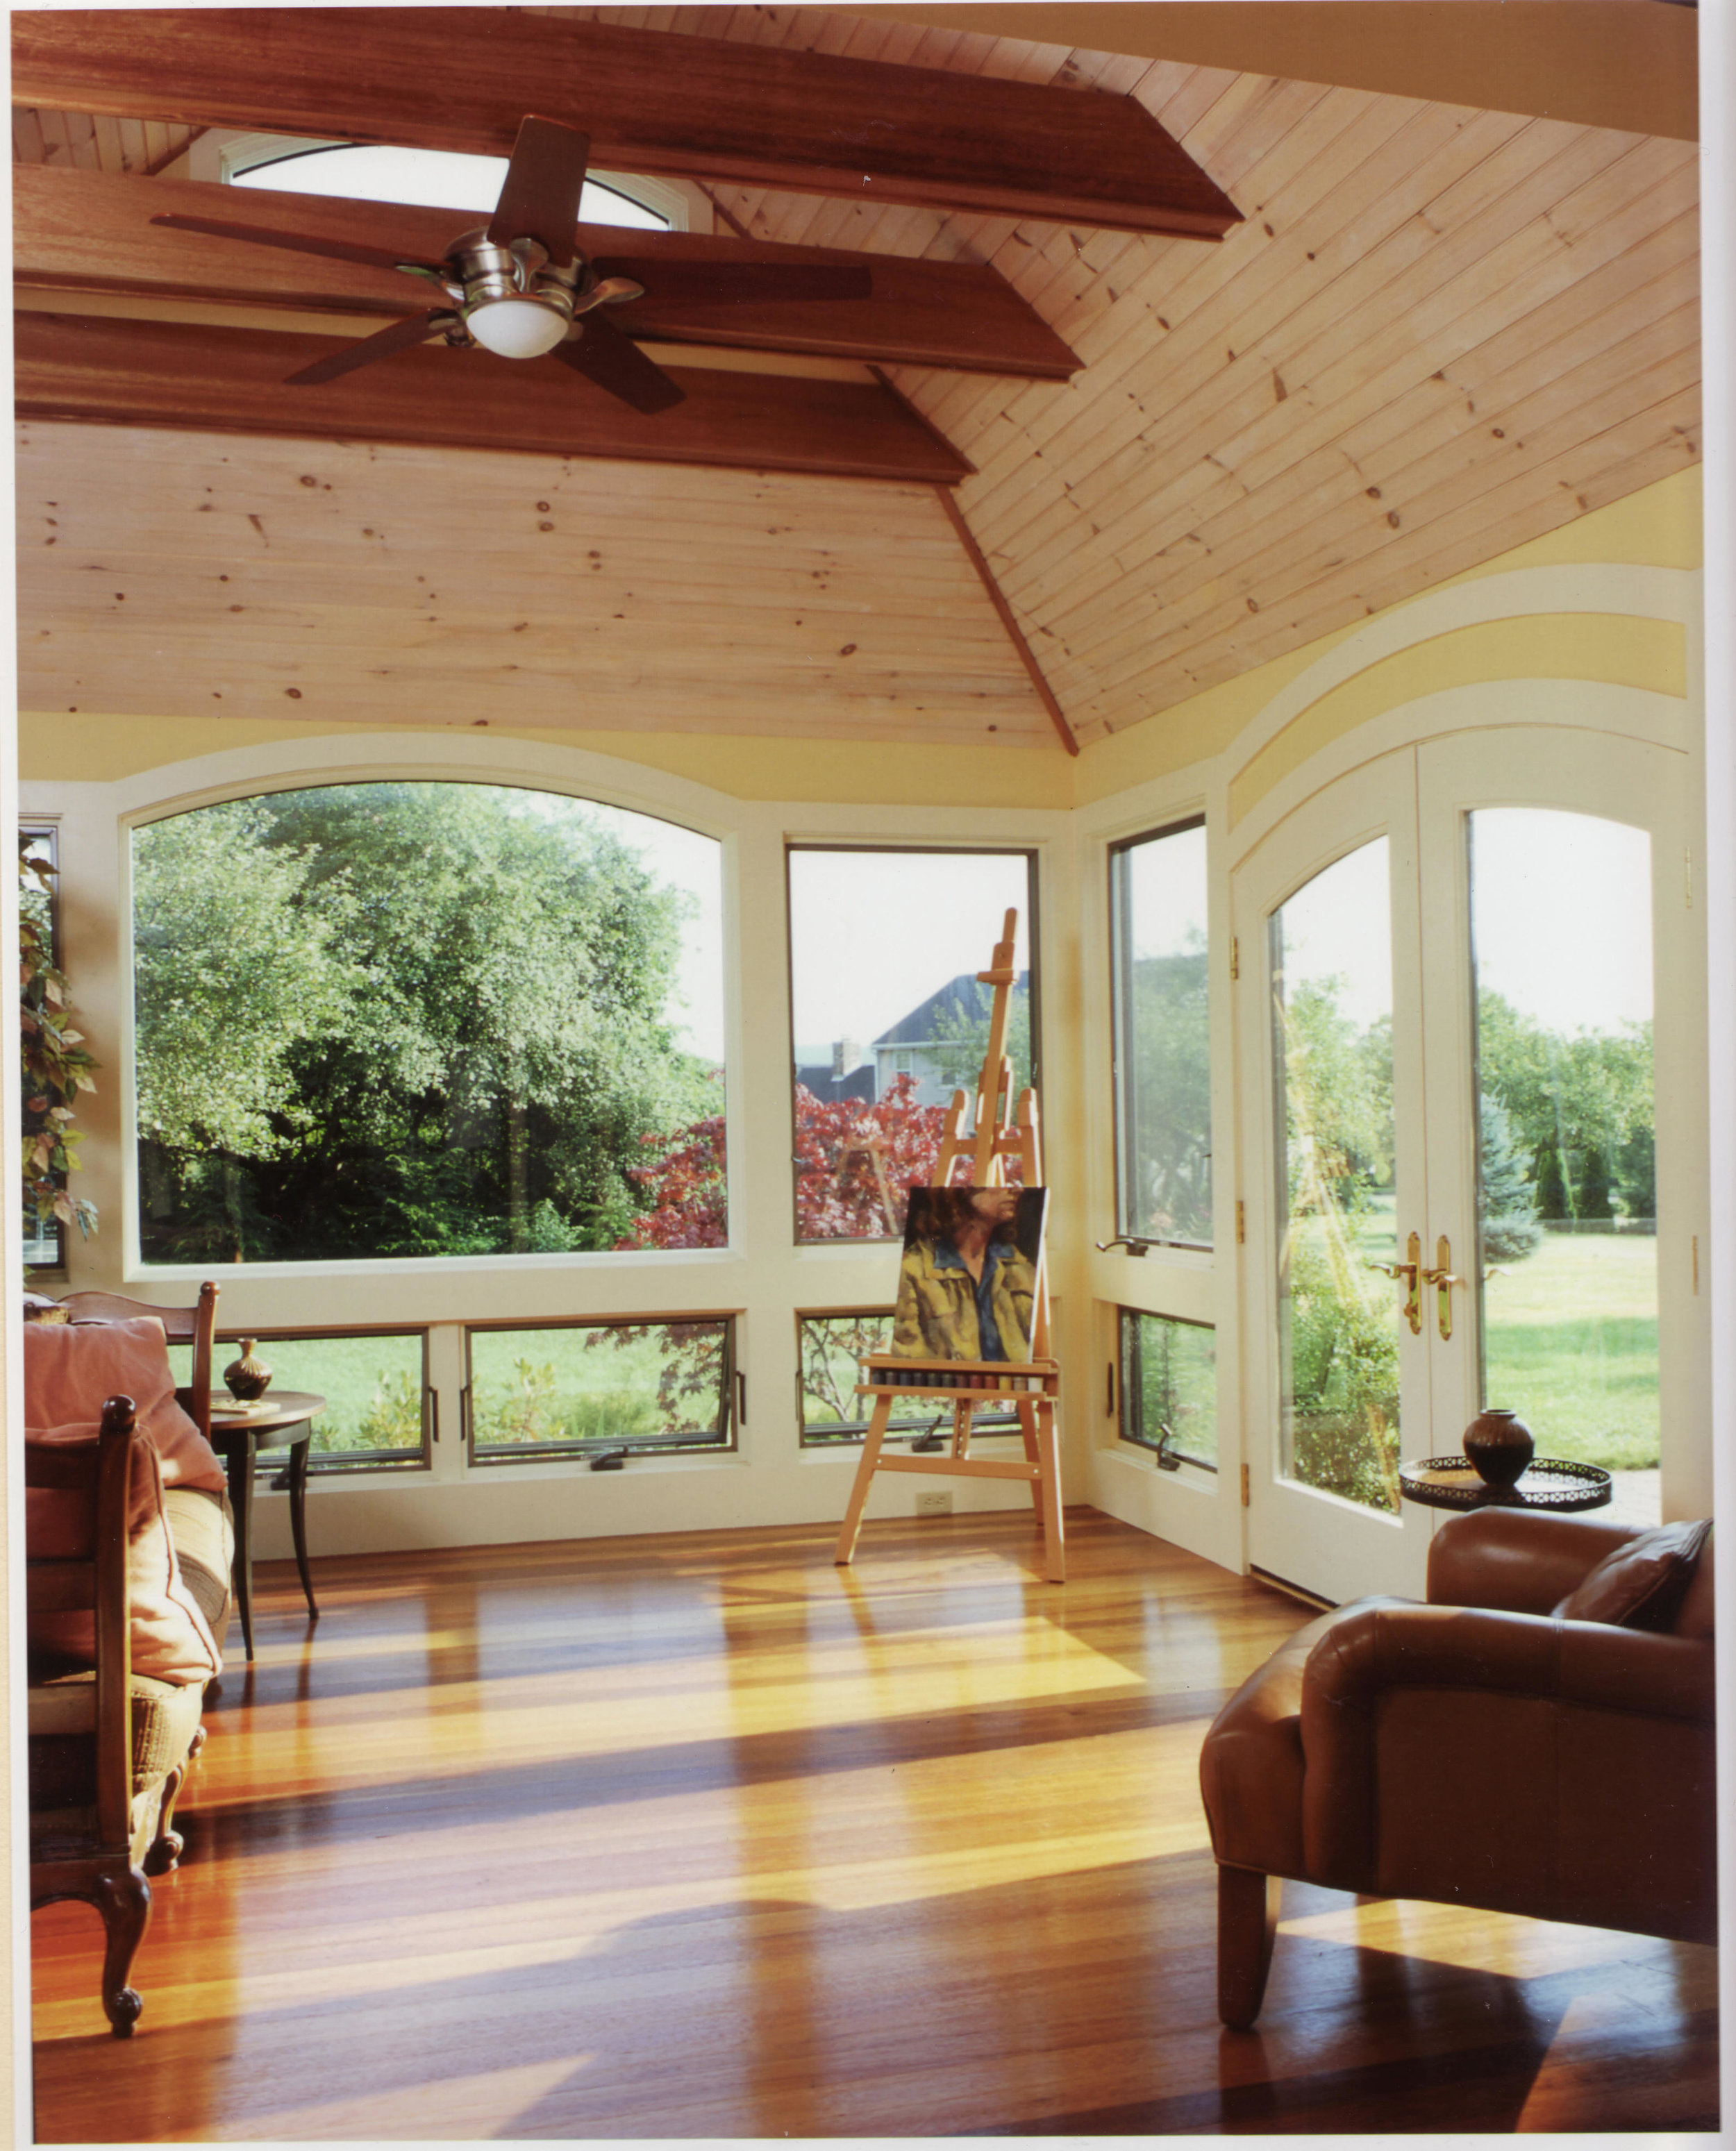 Sunroom interior_0006.jpg